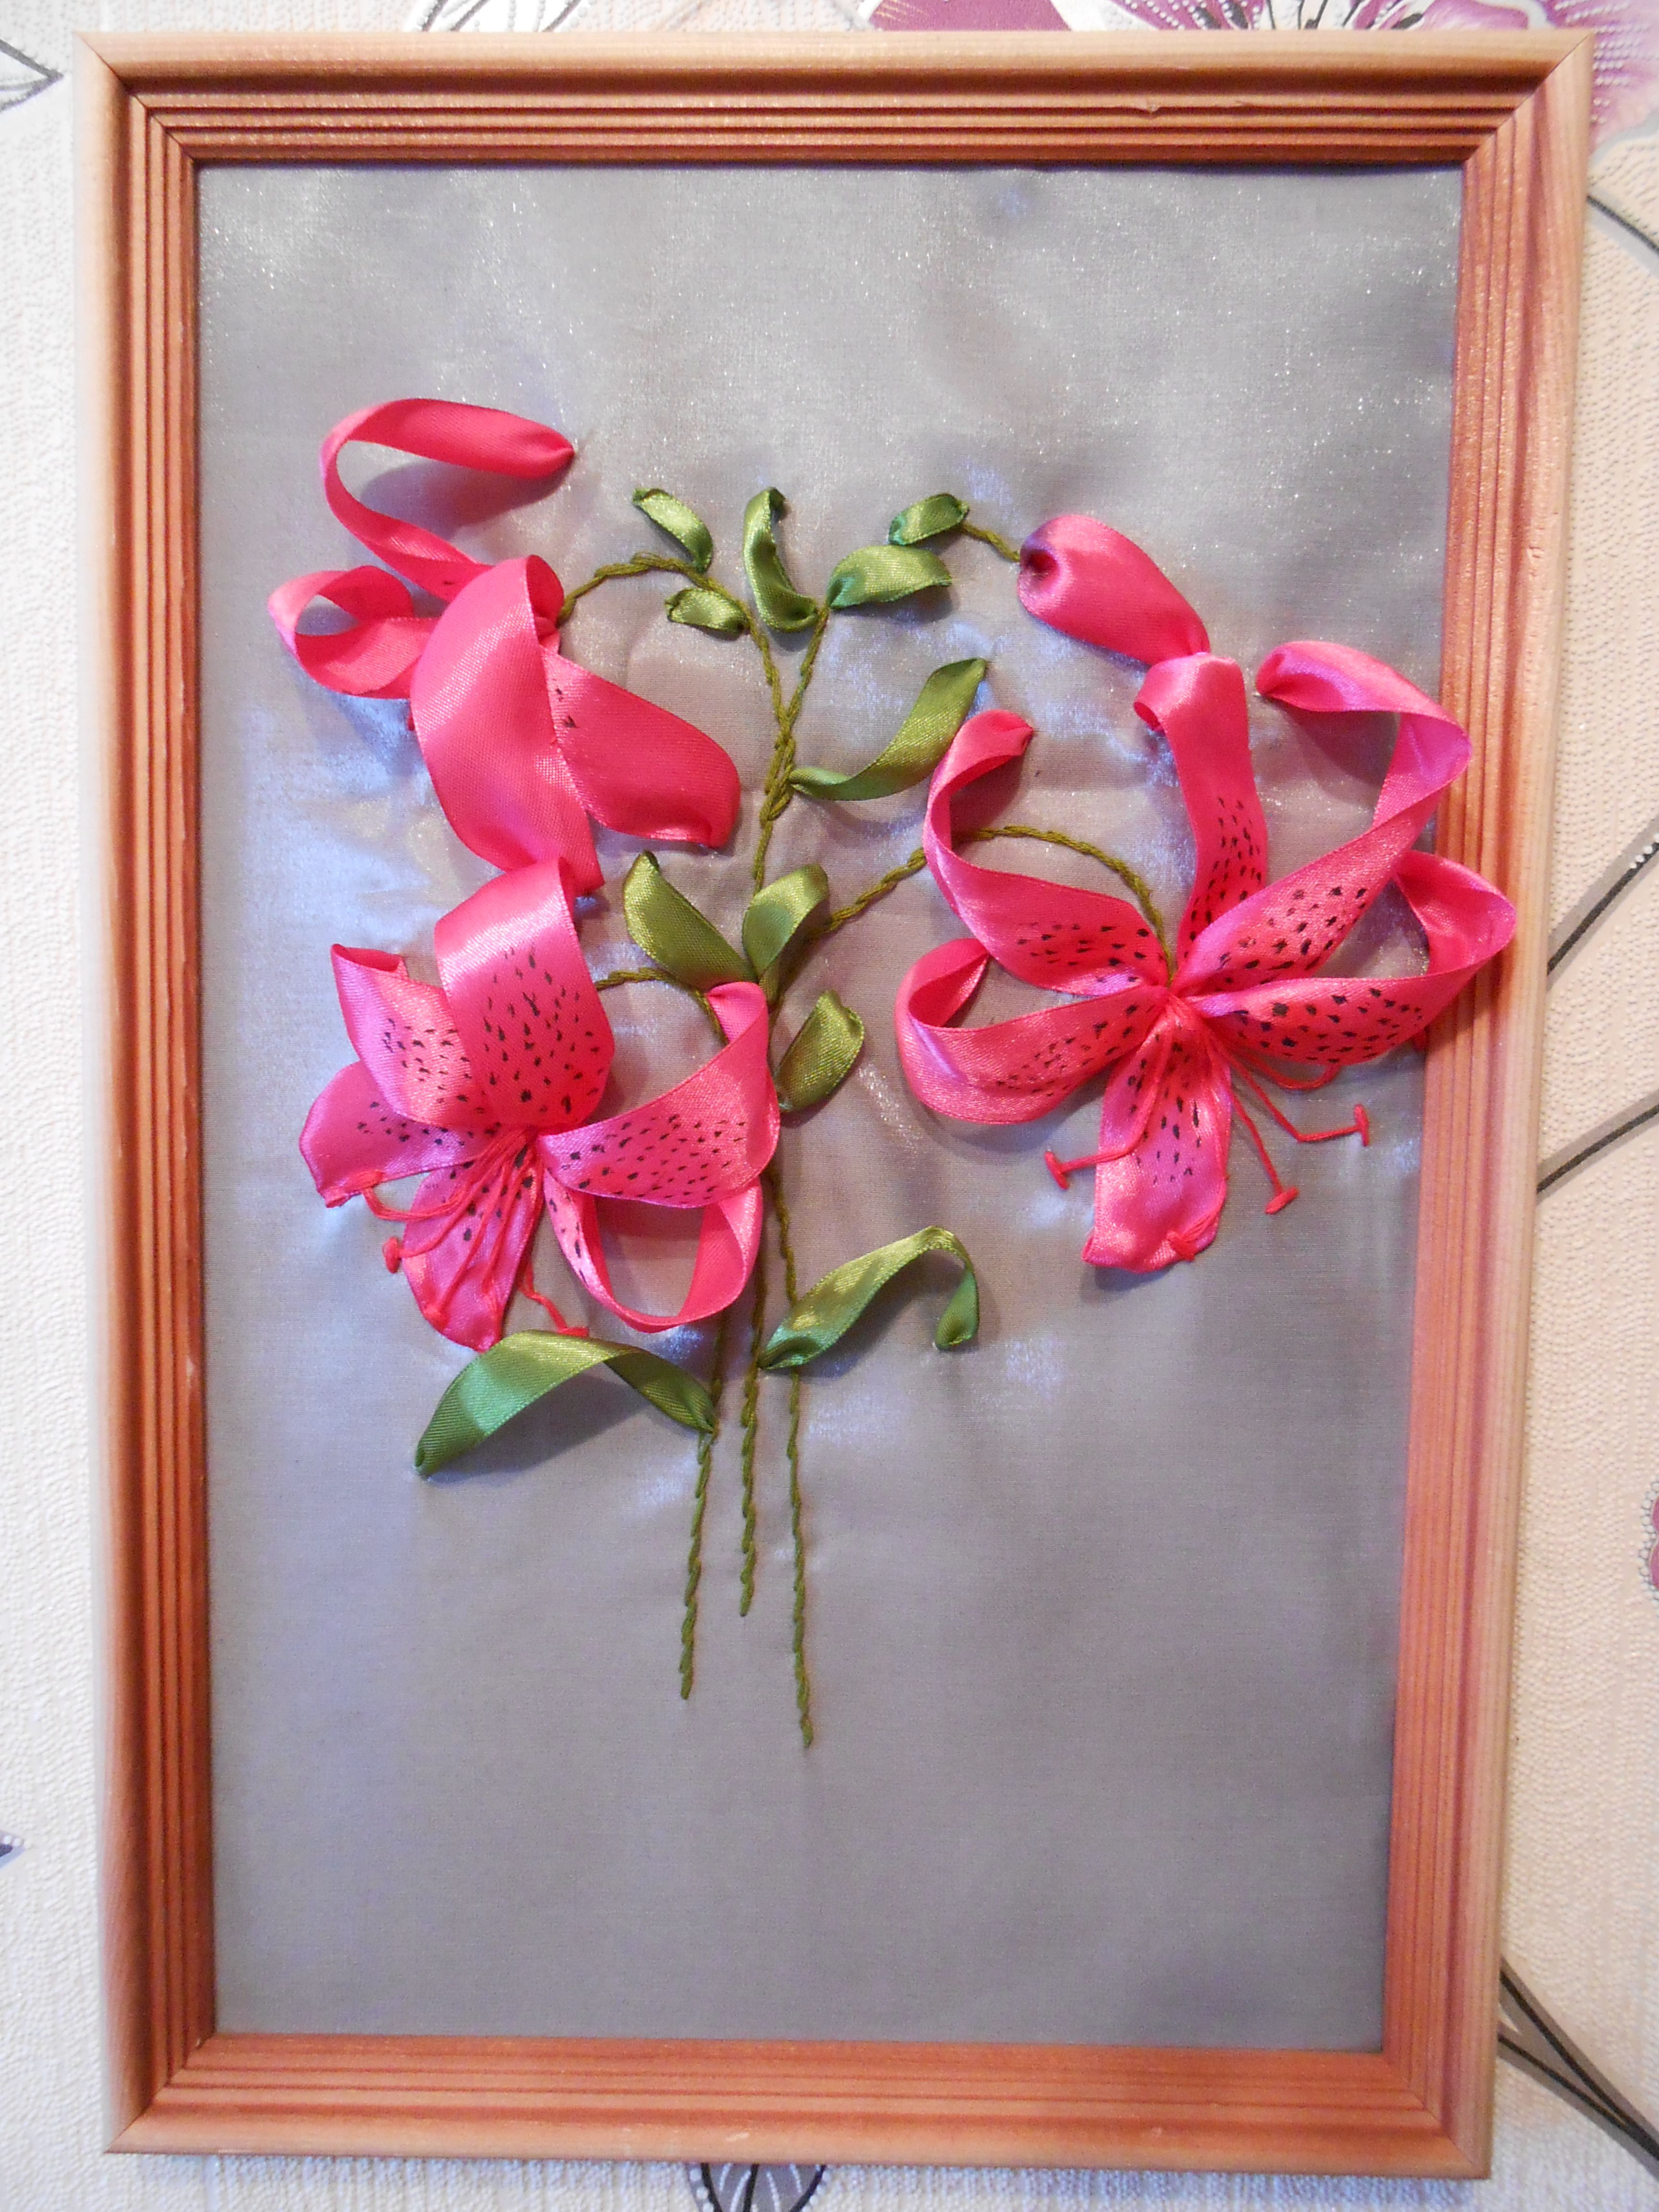 вышивкалентами картина панно подарок ручнаяработа